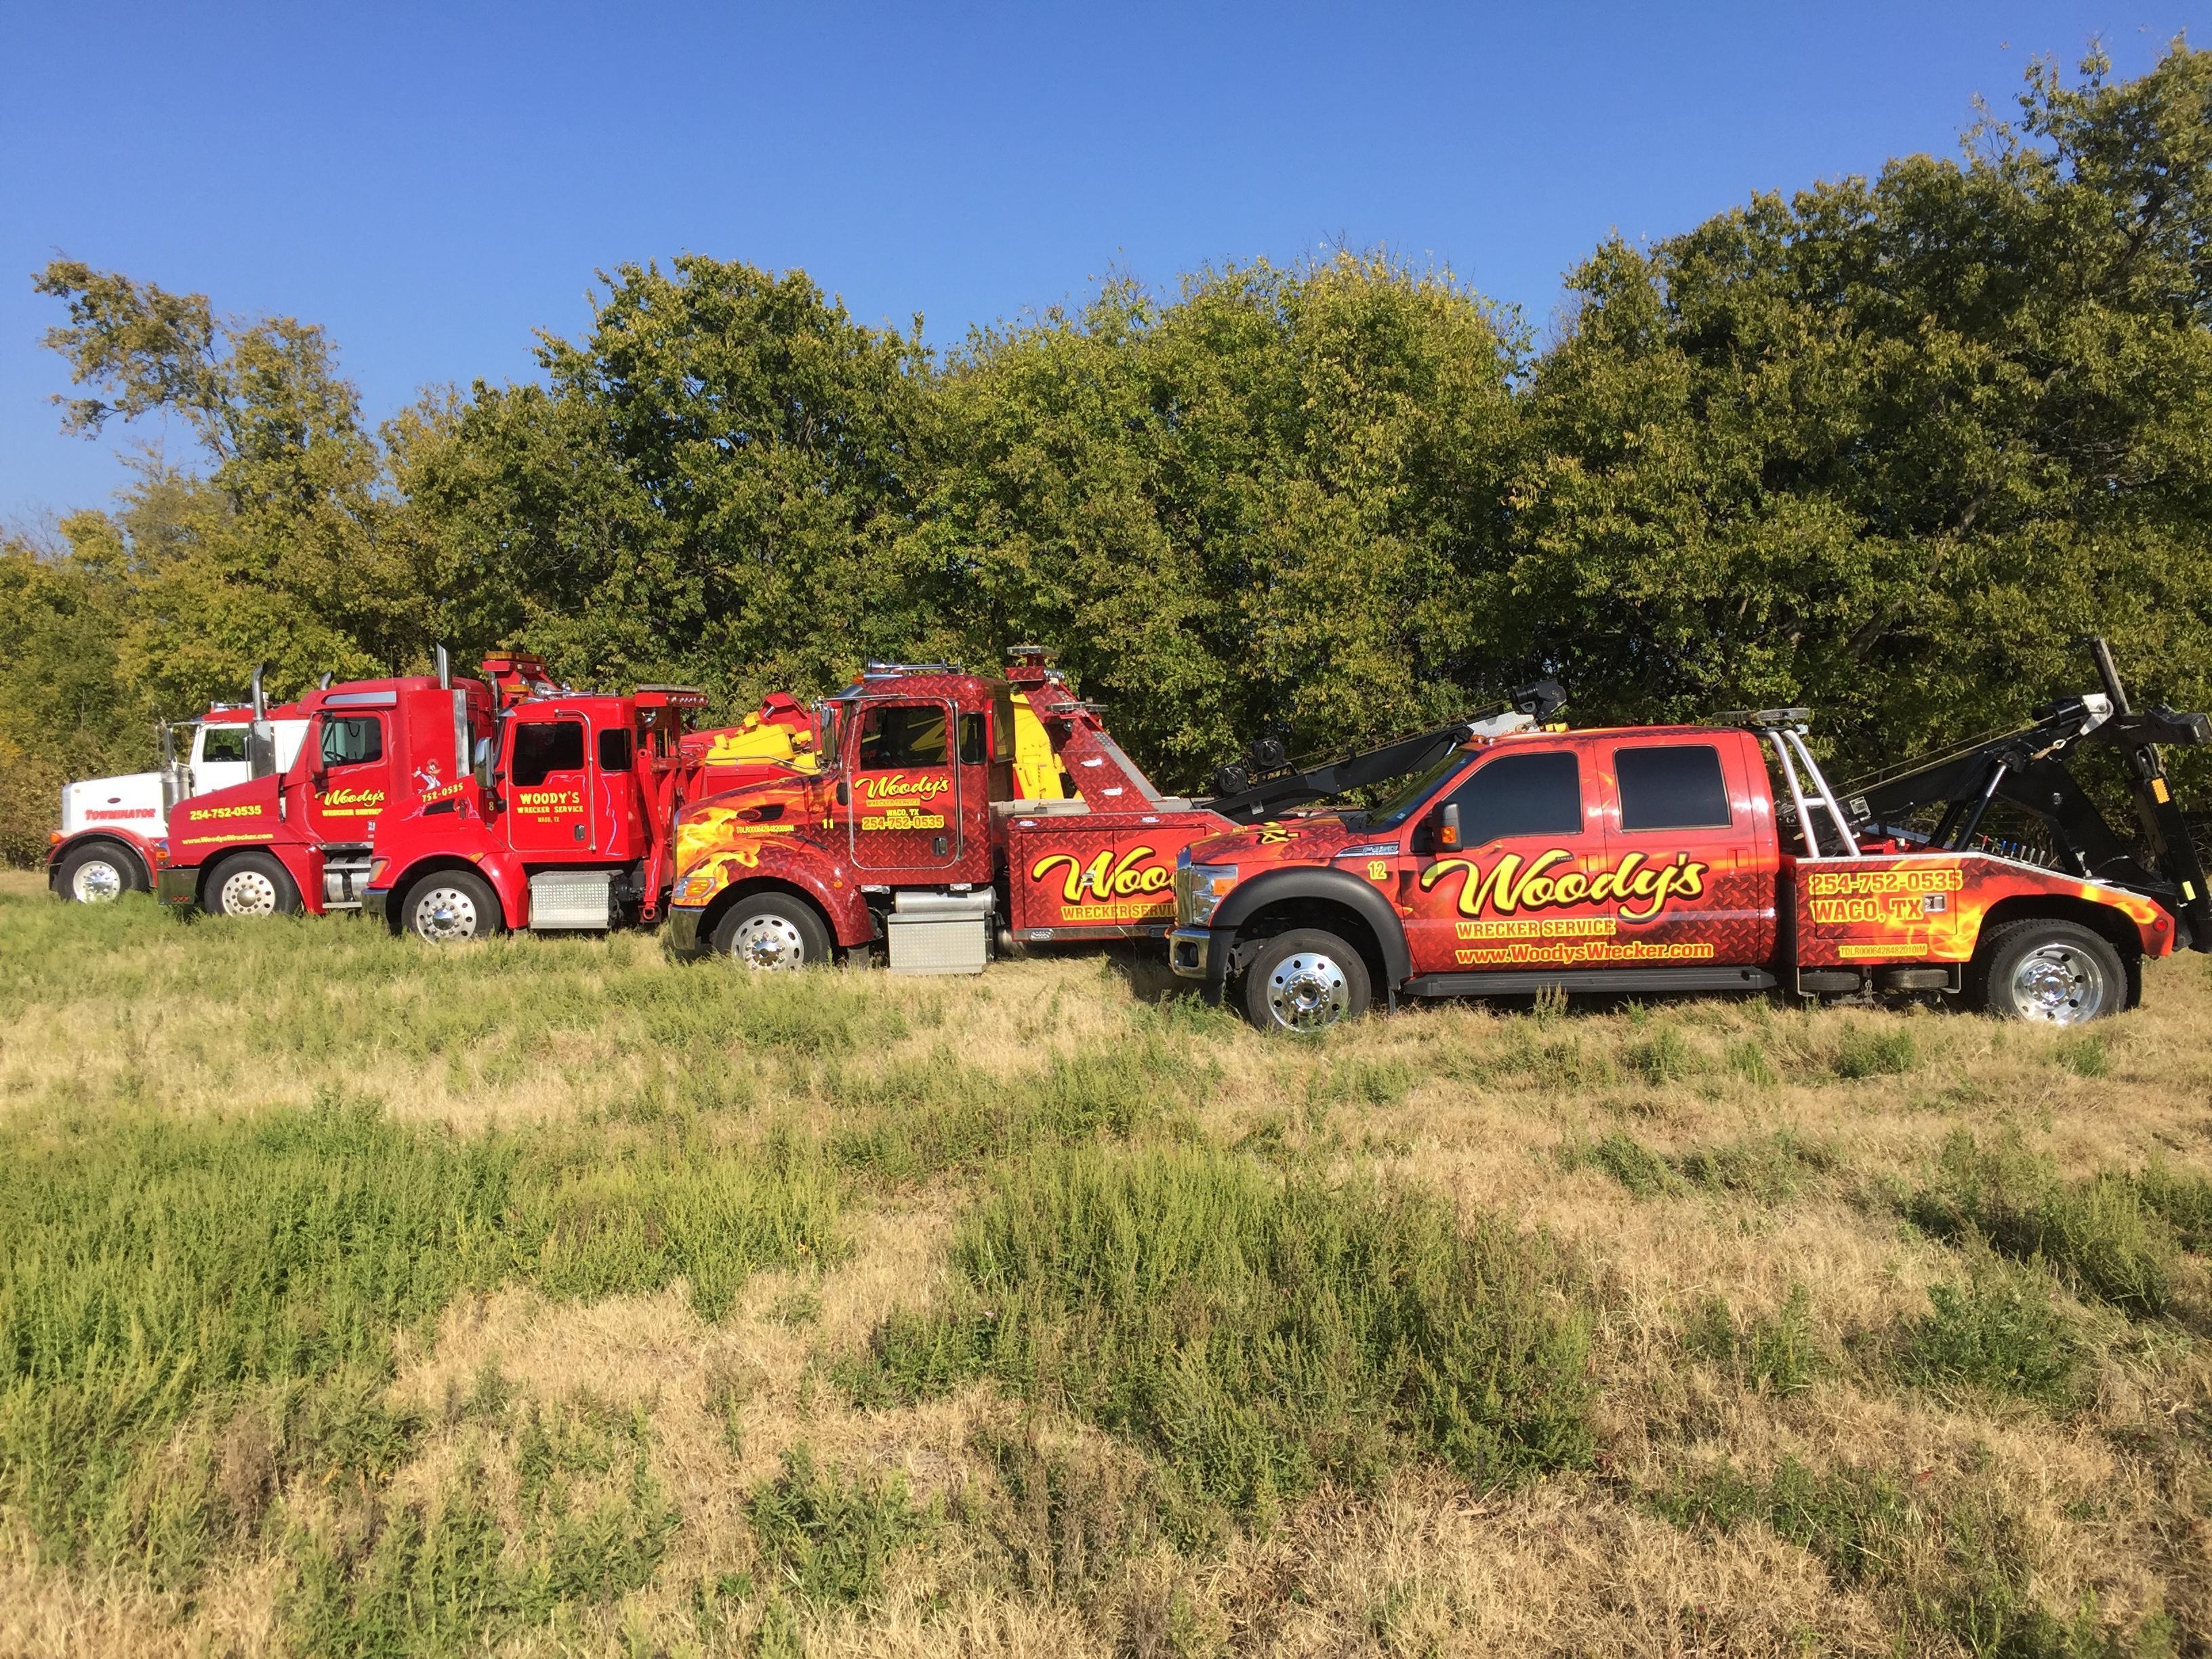 Pep Boys Near Me >> Woody's Wrecker Service, Waco Texas (TX) - LocalDatabase.com